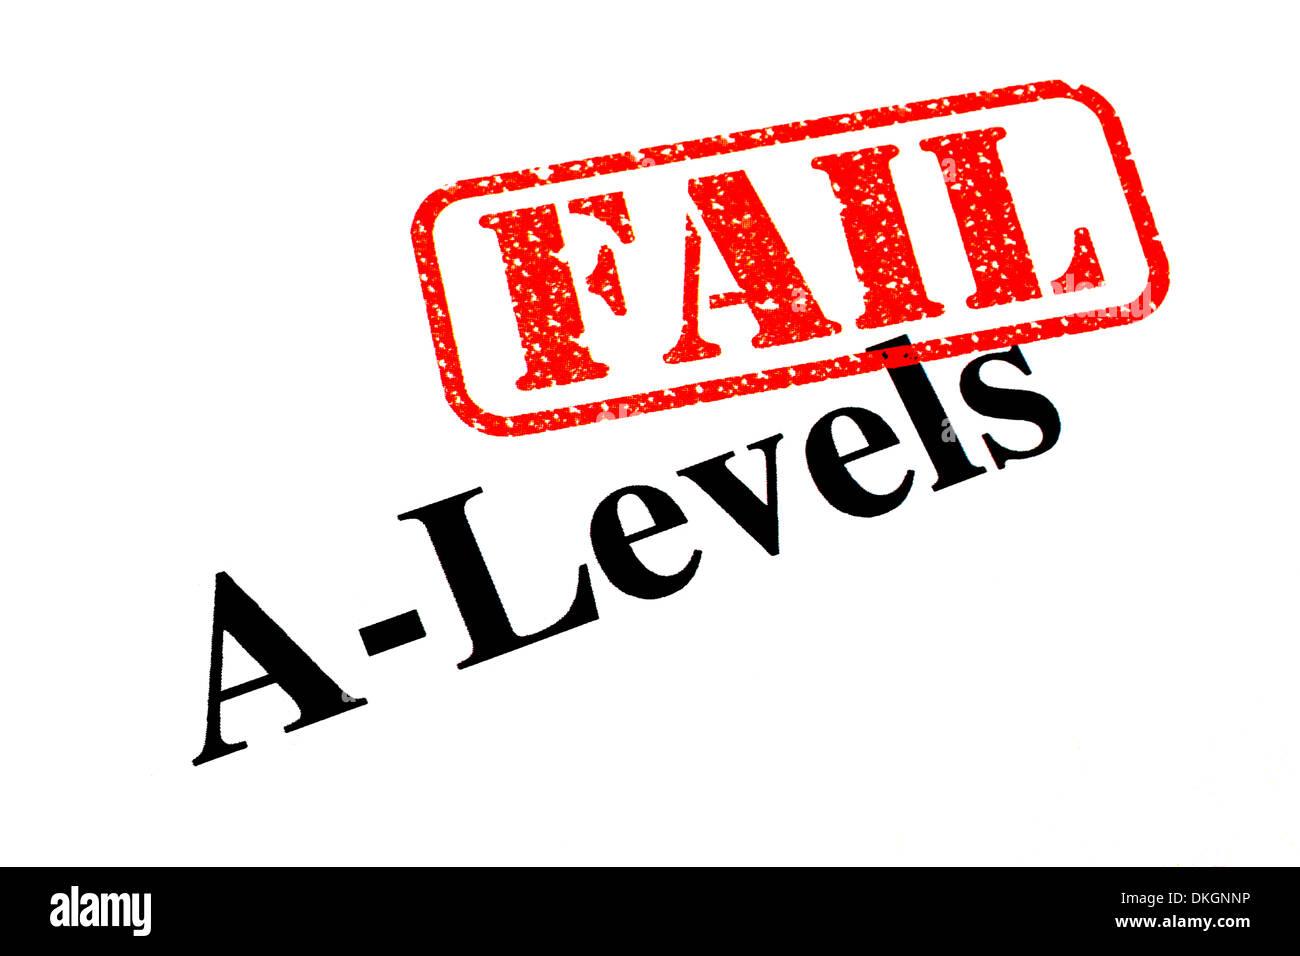 Failed A-Level Exams. - Stock Image